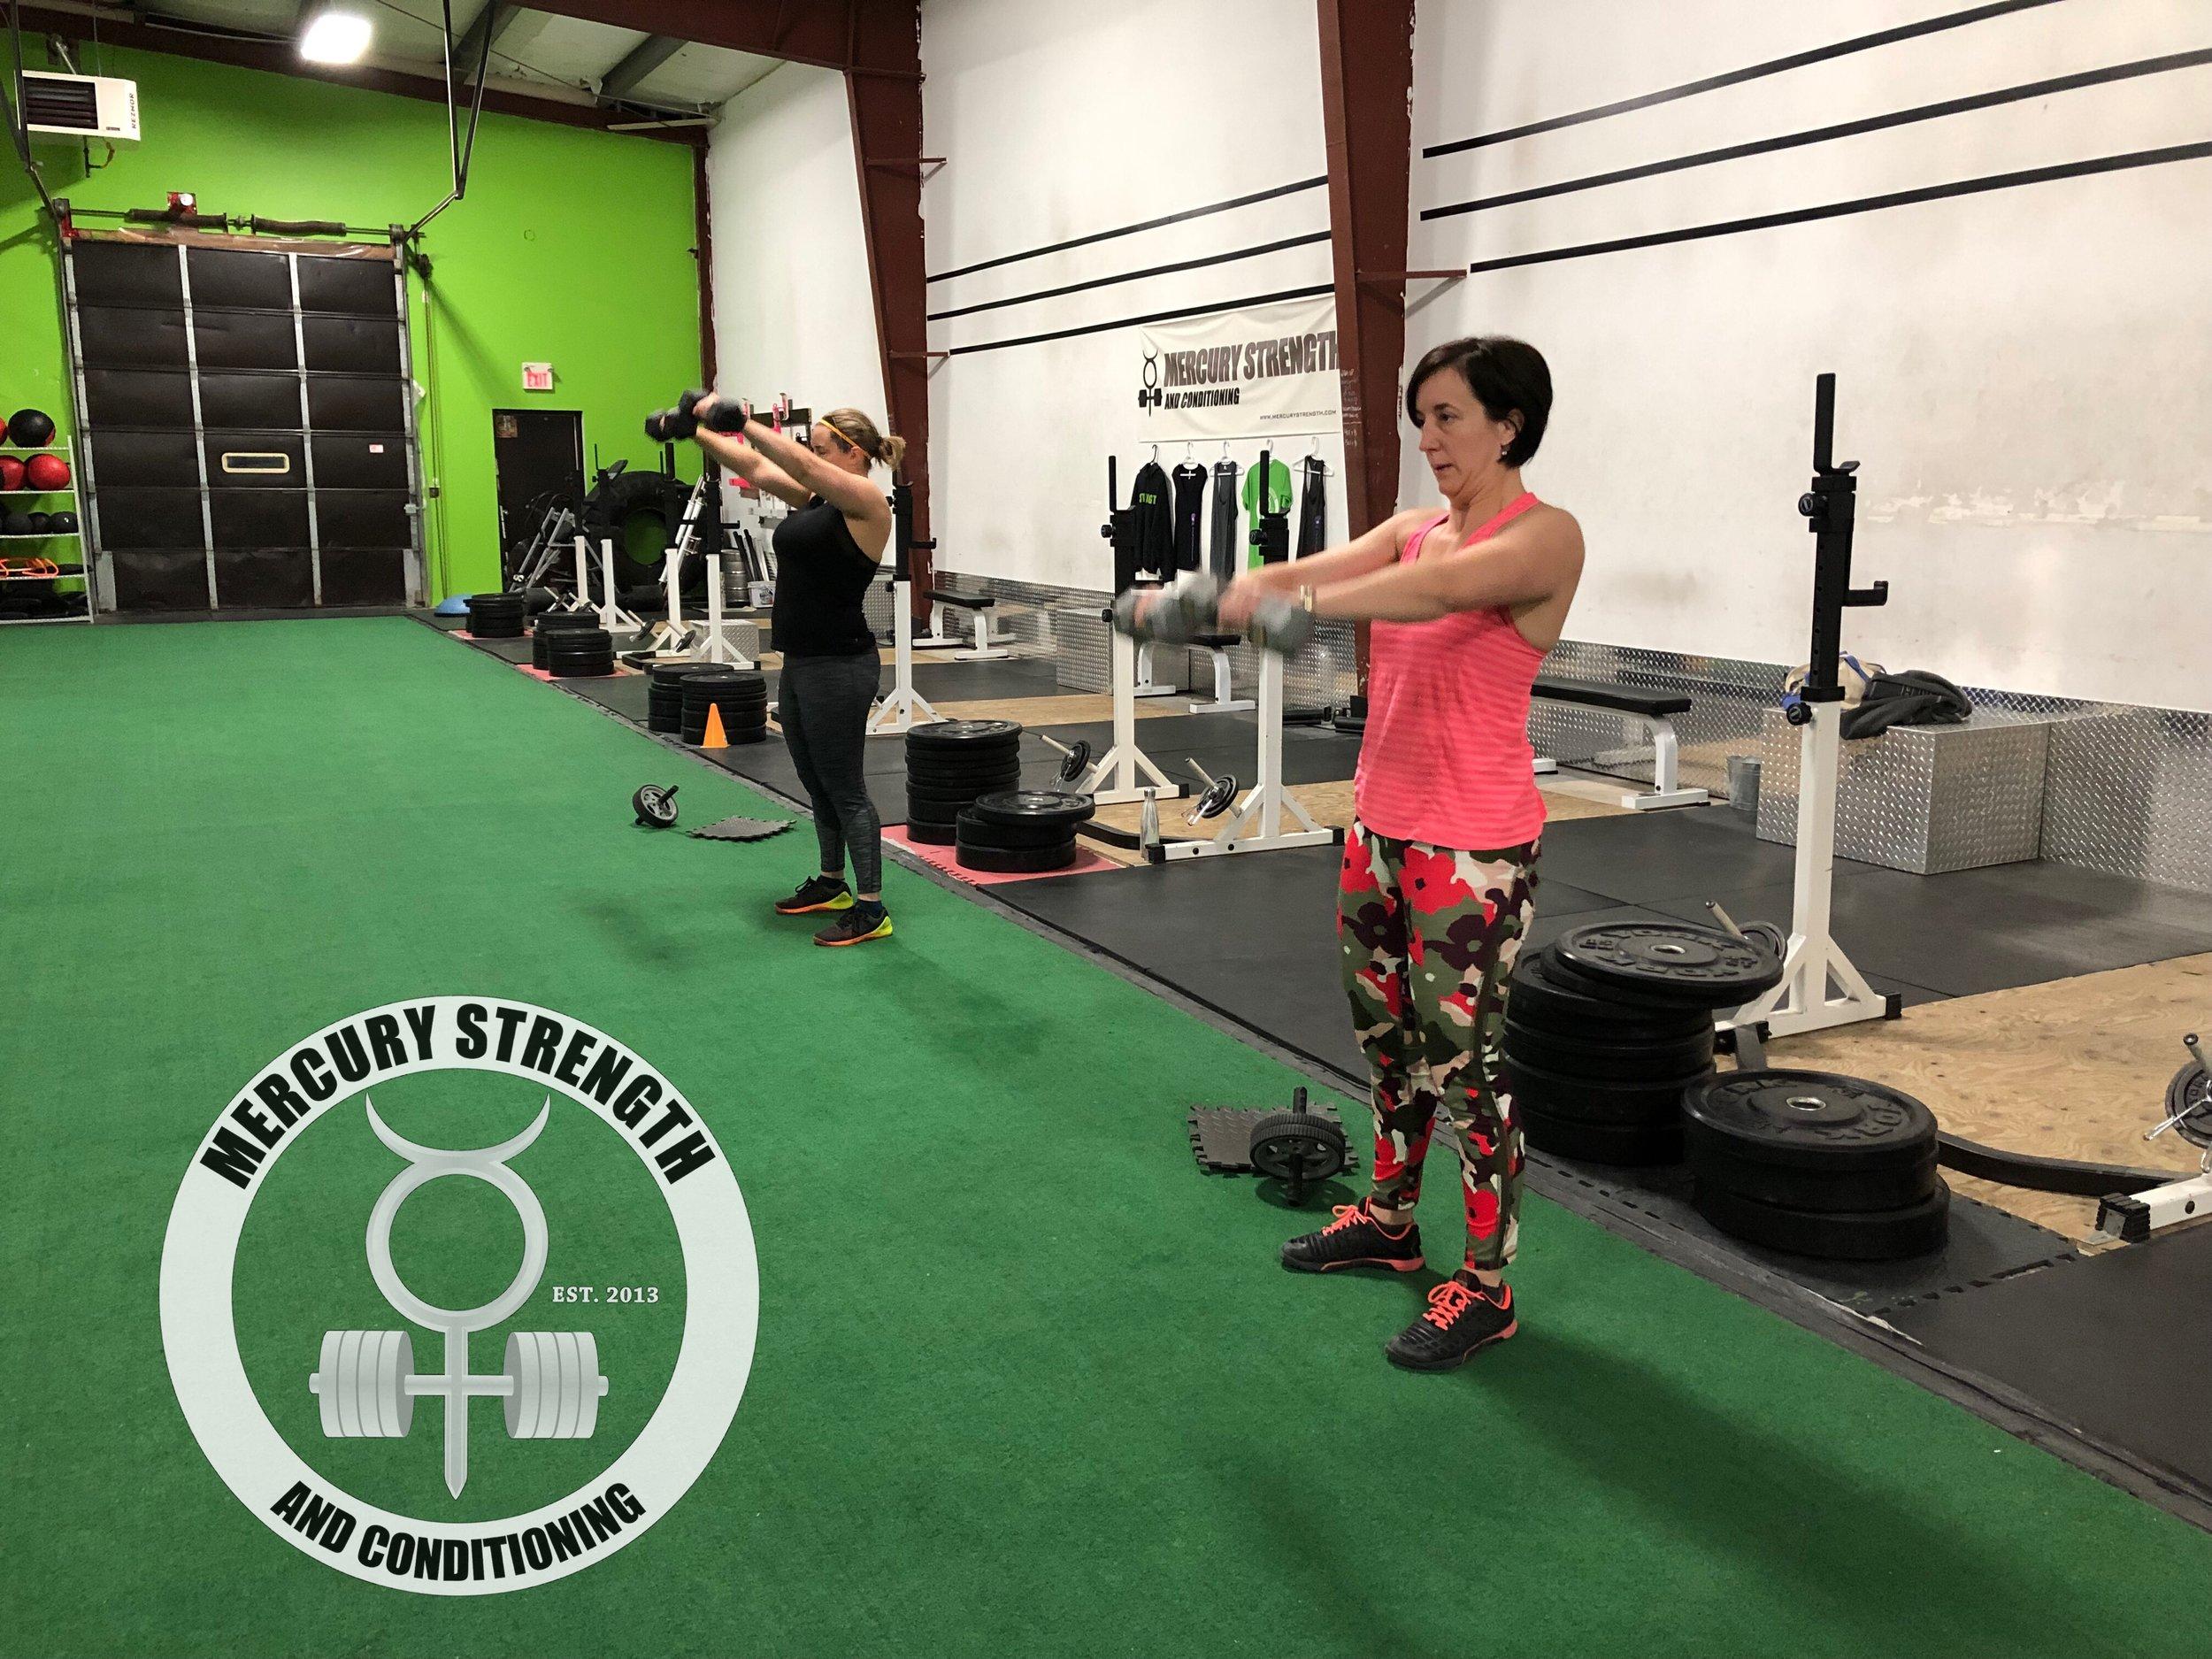 Gym-powerlifting-Olympic lifting-fitness-personal training-training-bootcamp-crossfit-kingston-kingston gym-kids-mercury-strength-conditioning-athlete-deltoid raises